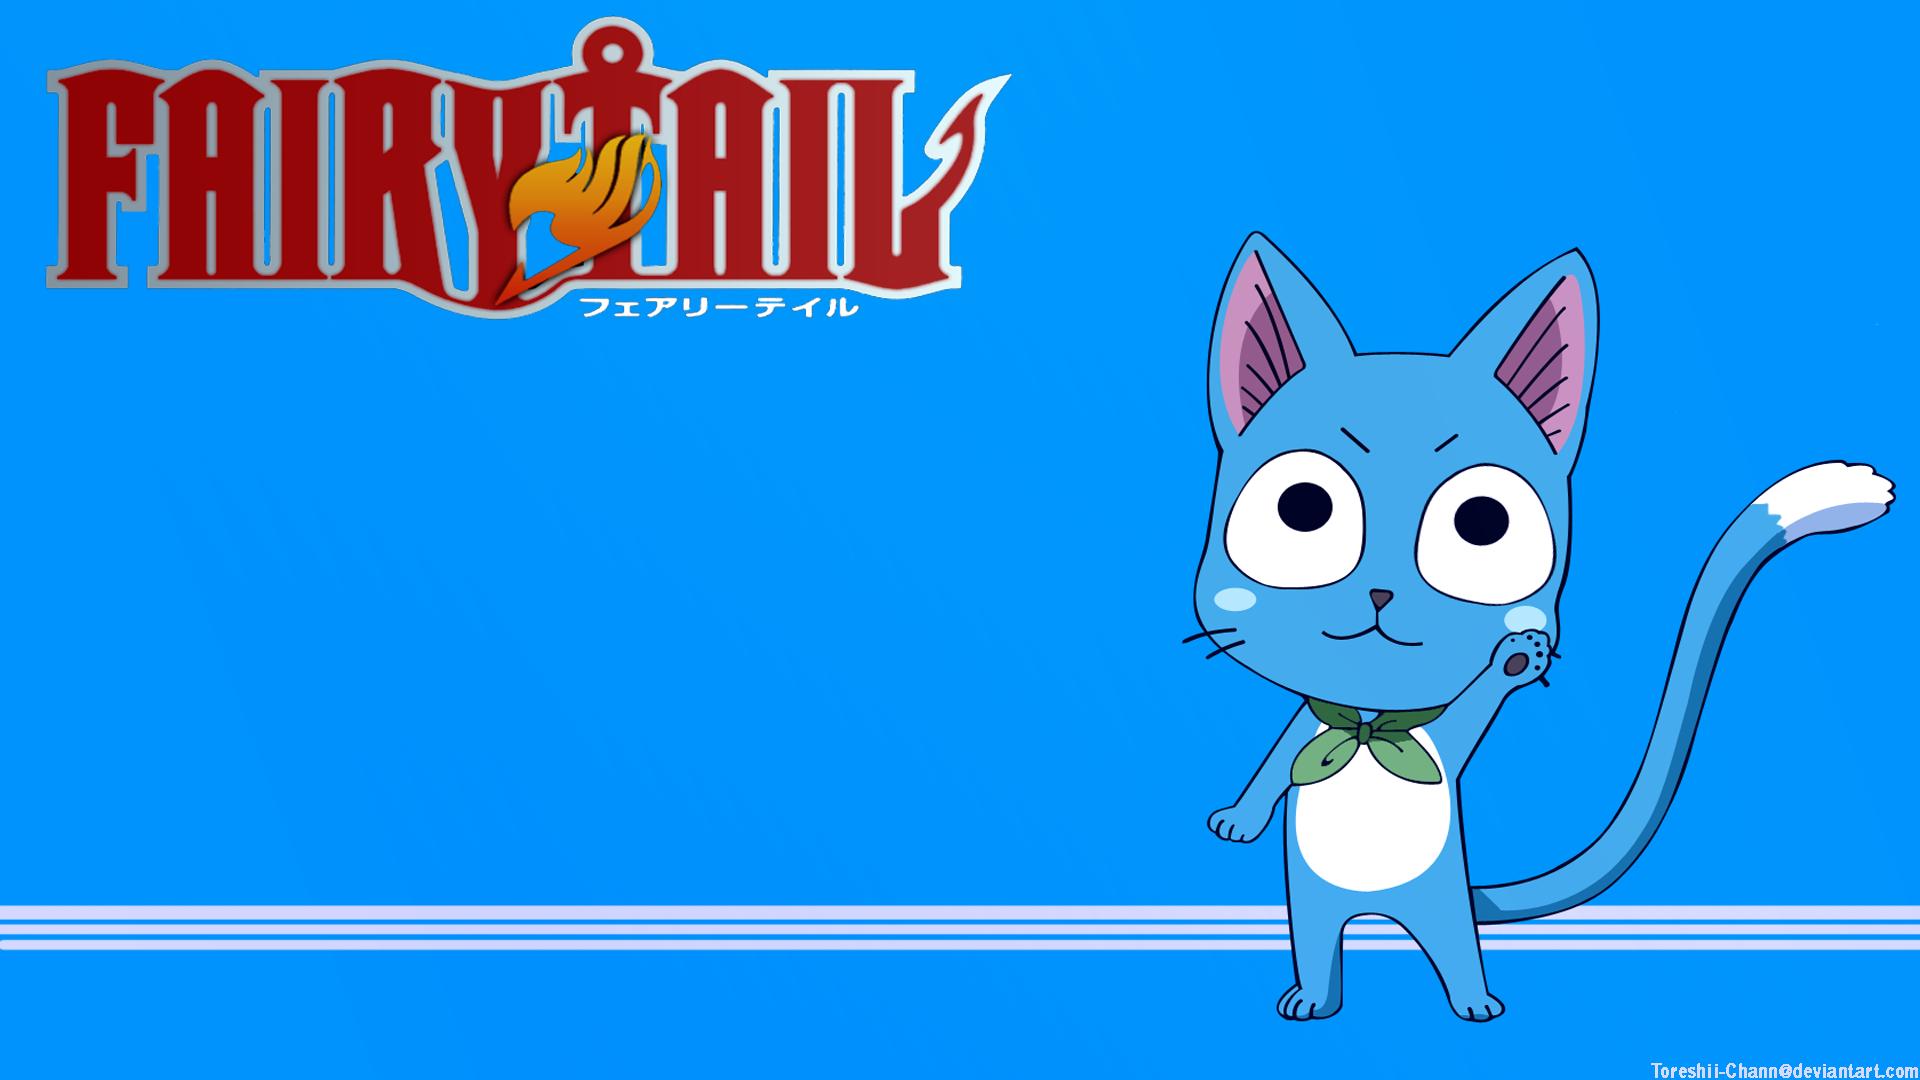 Fairy Tail Fond d'écran HD   Arrière-Plan   1920x1080   ID:743671 - Wallpaper Abyss